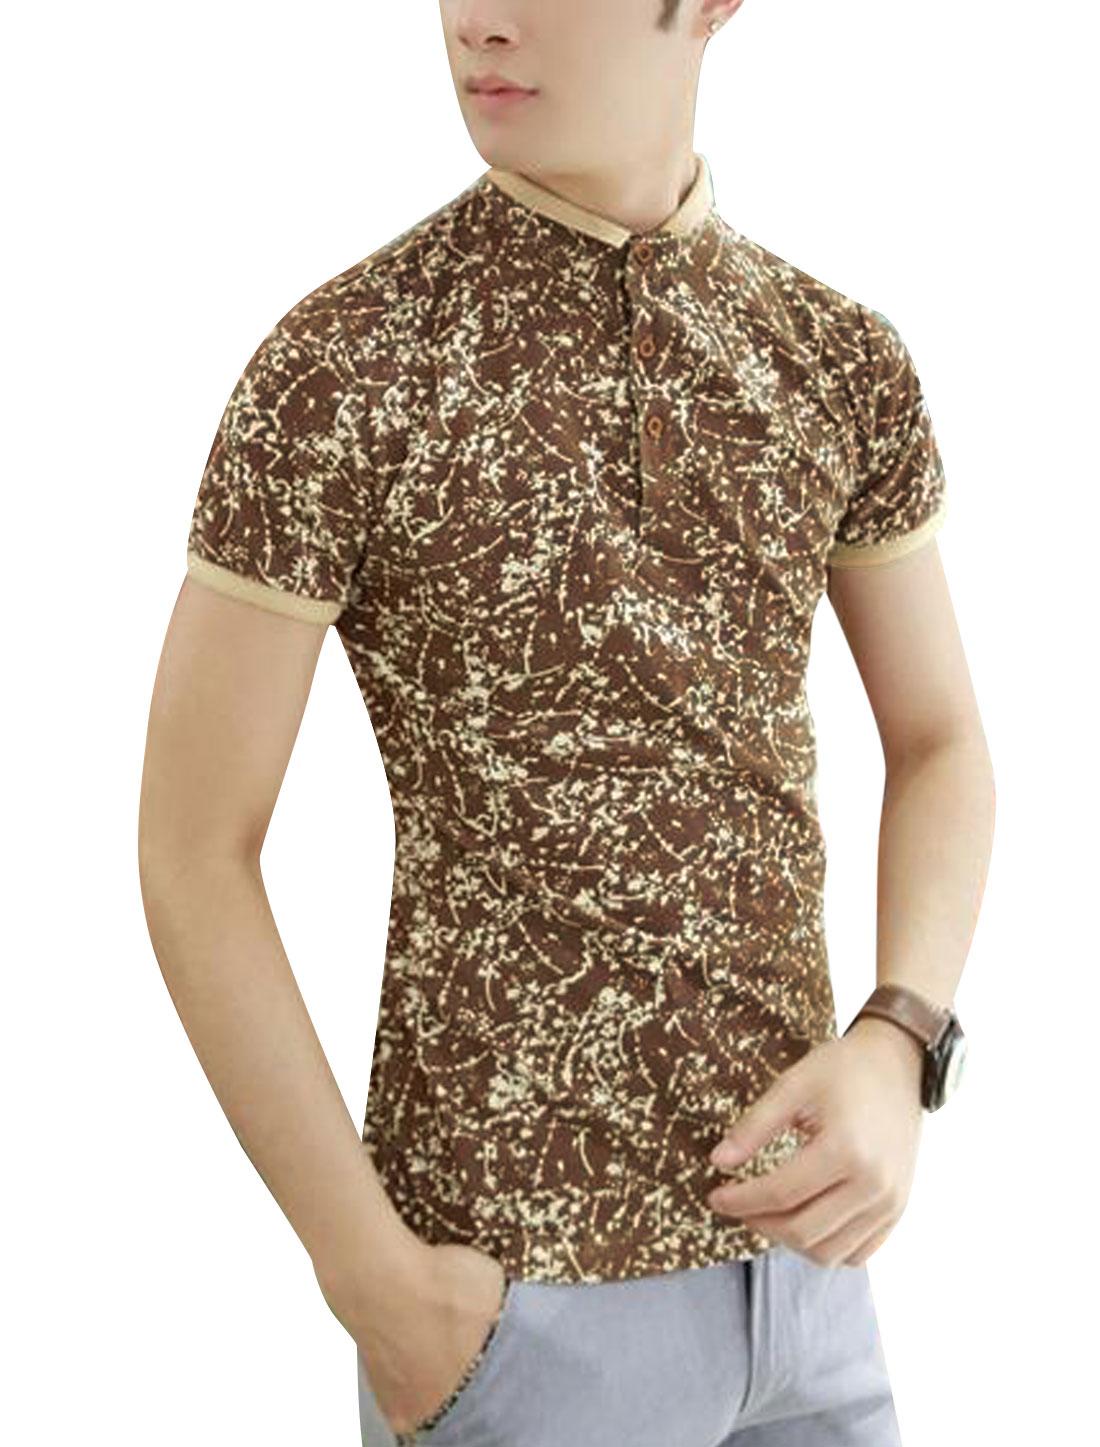 Novelty Print Contrast Collar Cuffs Stand Collar Brown M T Shirt for Men